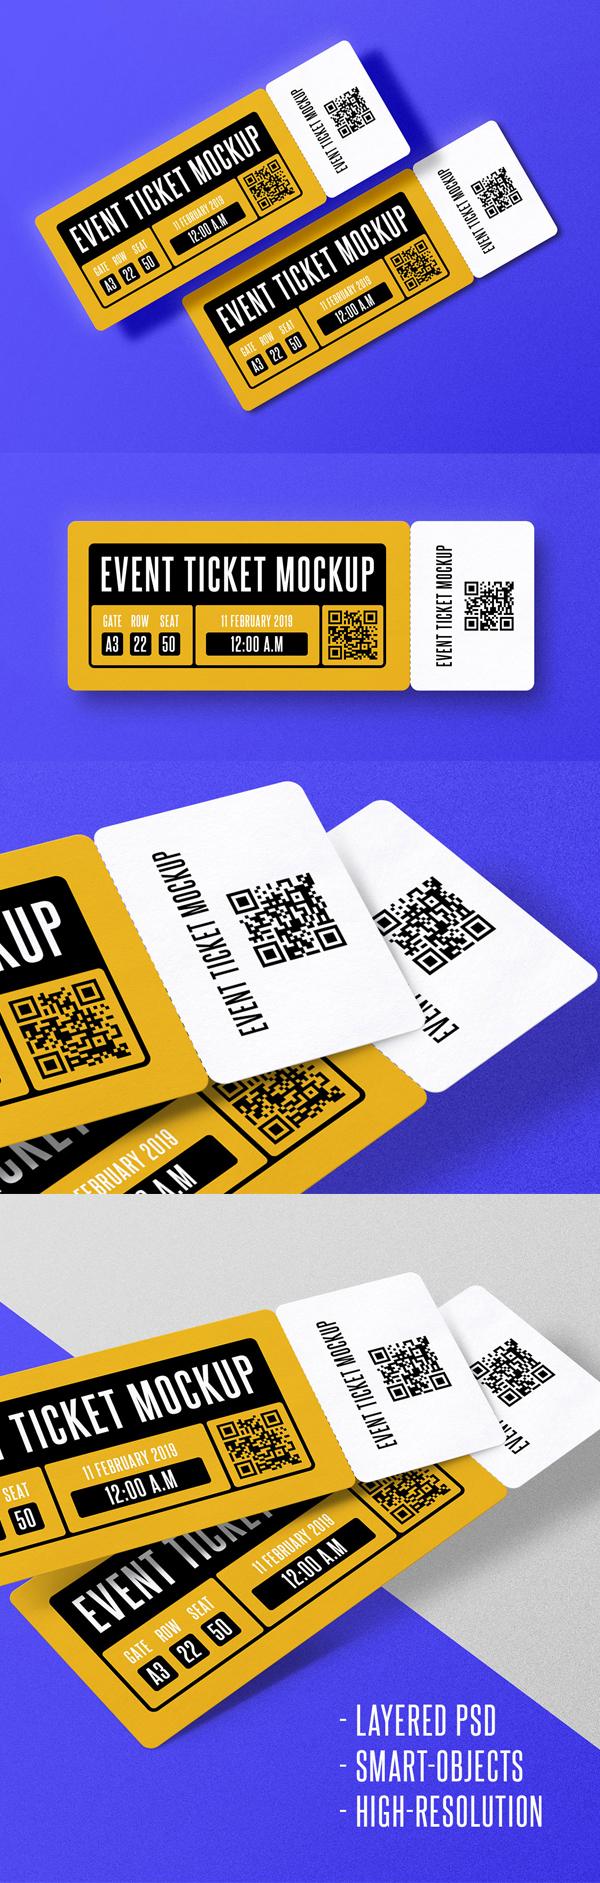 Free Event Ticket Mockup